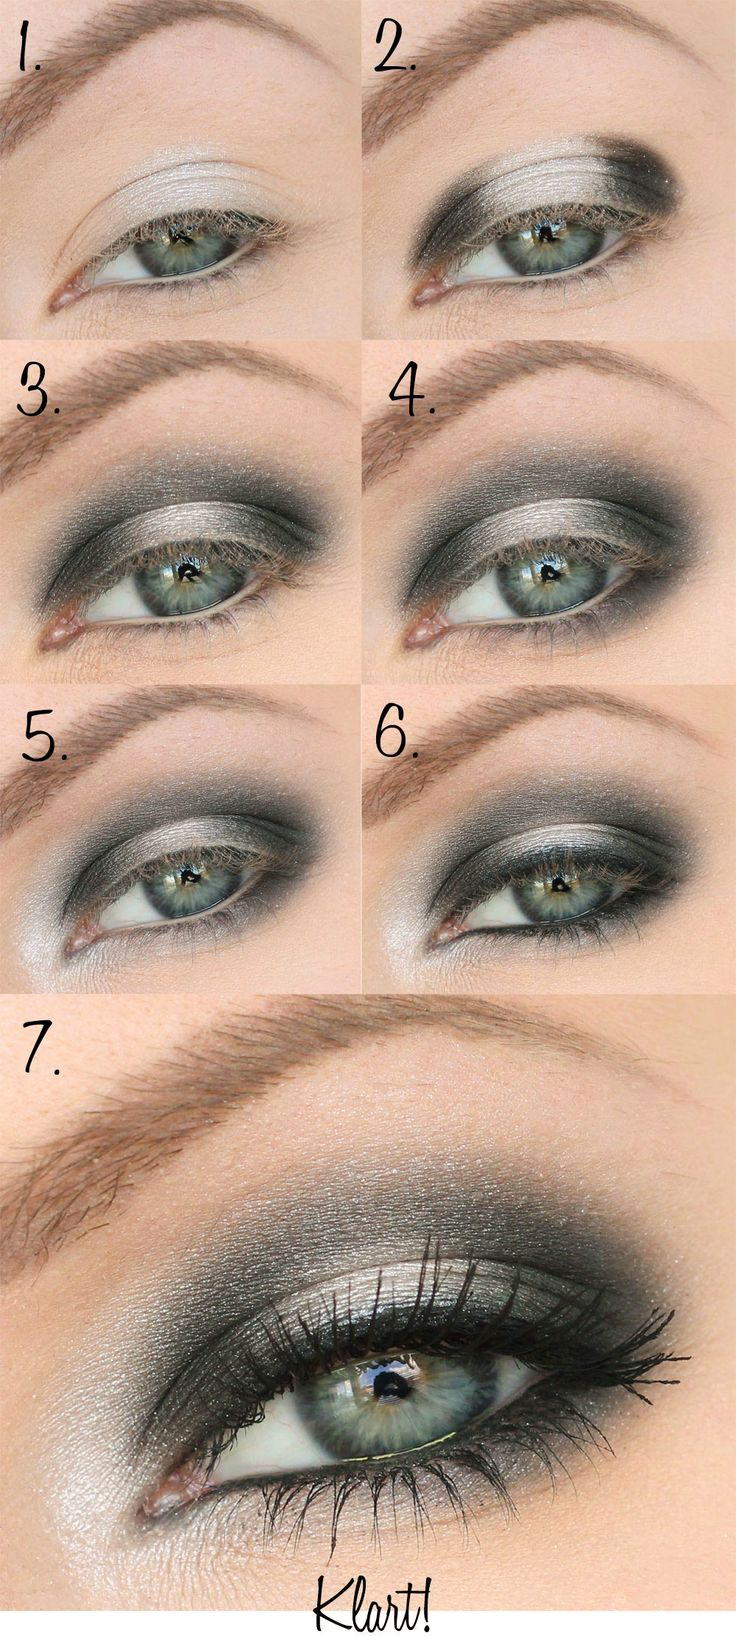 smokey eye tutorial tutoriales de maquillaje pictorials pinterest gonmakeup h r och. Black Bedroom Furniture Sets. Home Design Ideas